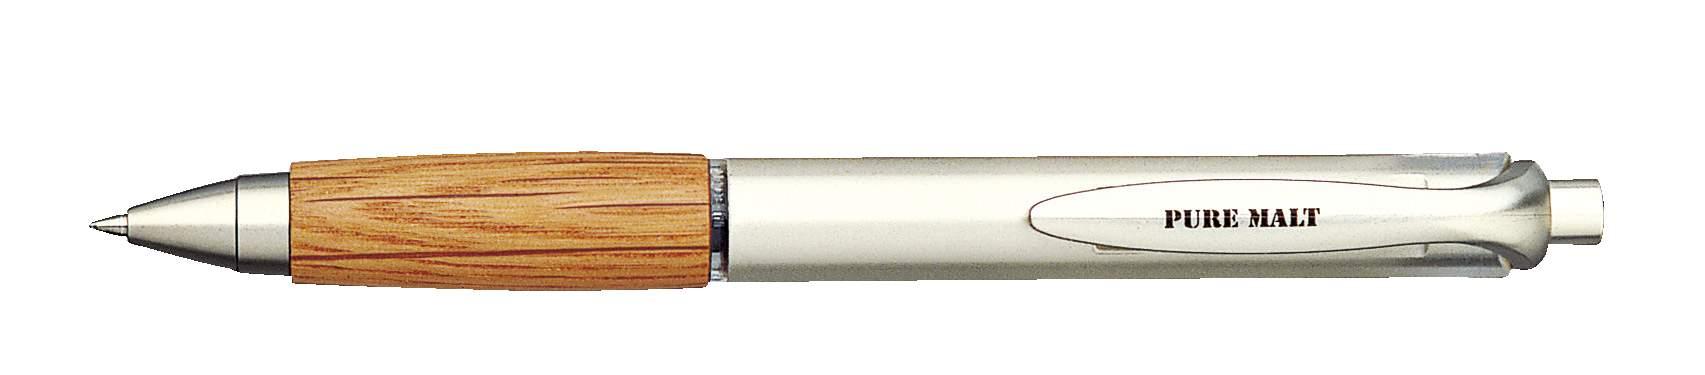 mtUMN-515.70